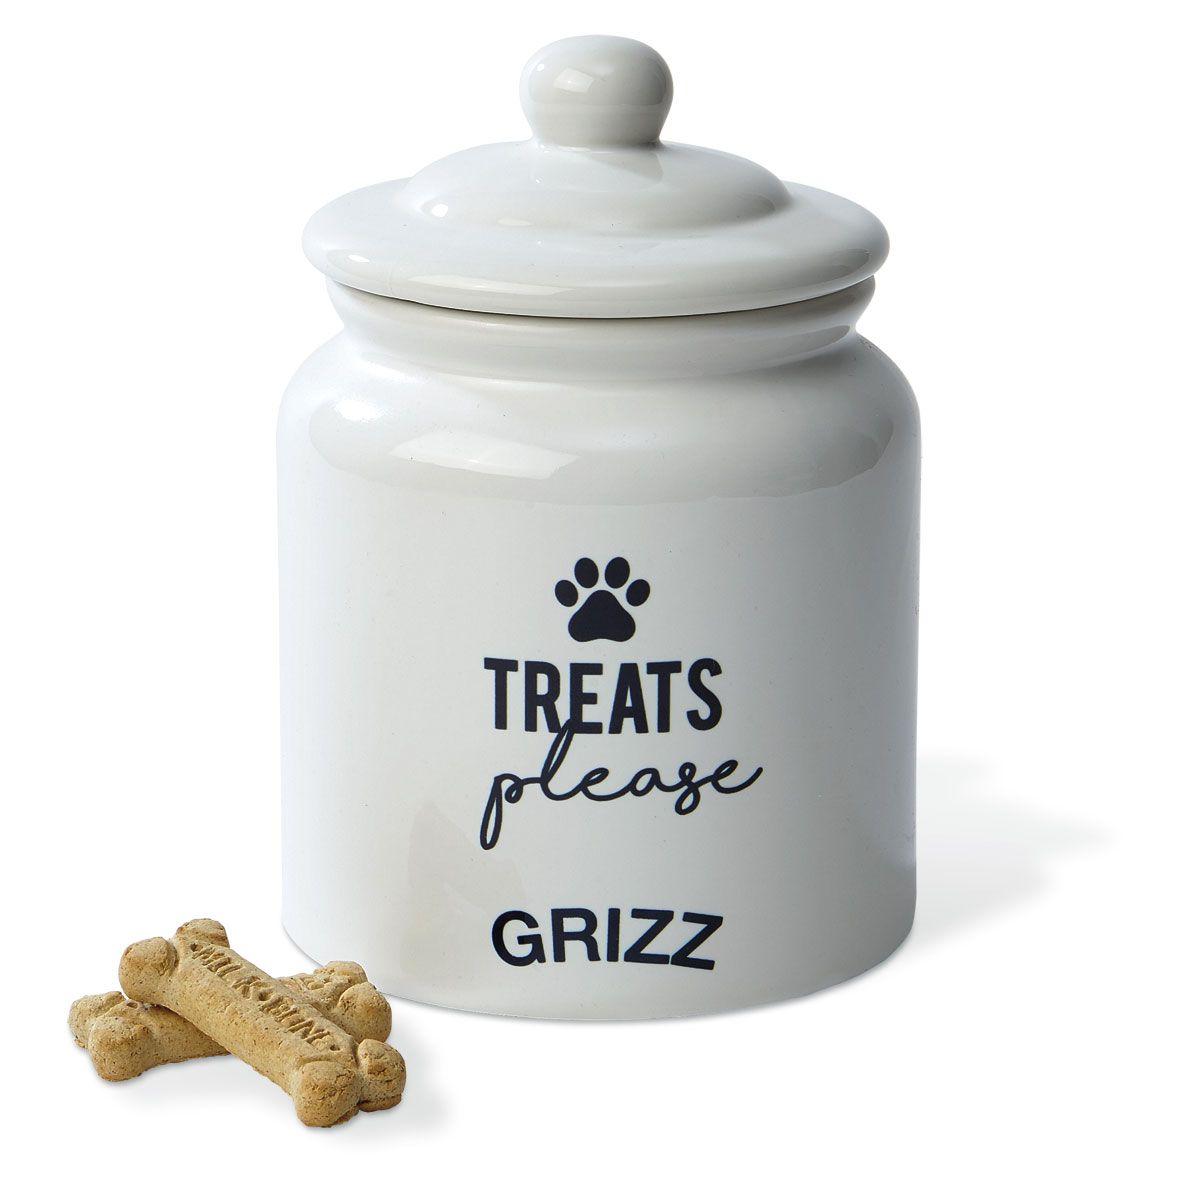 Personalized Ceramic Treat Jar